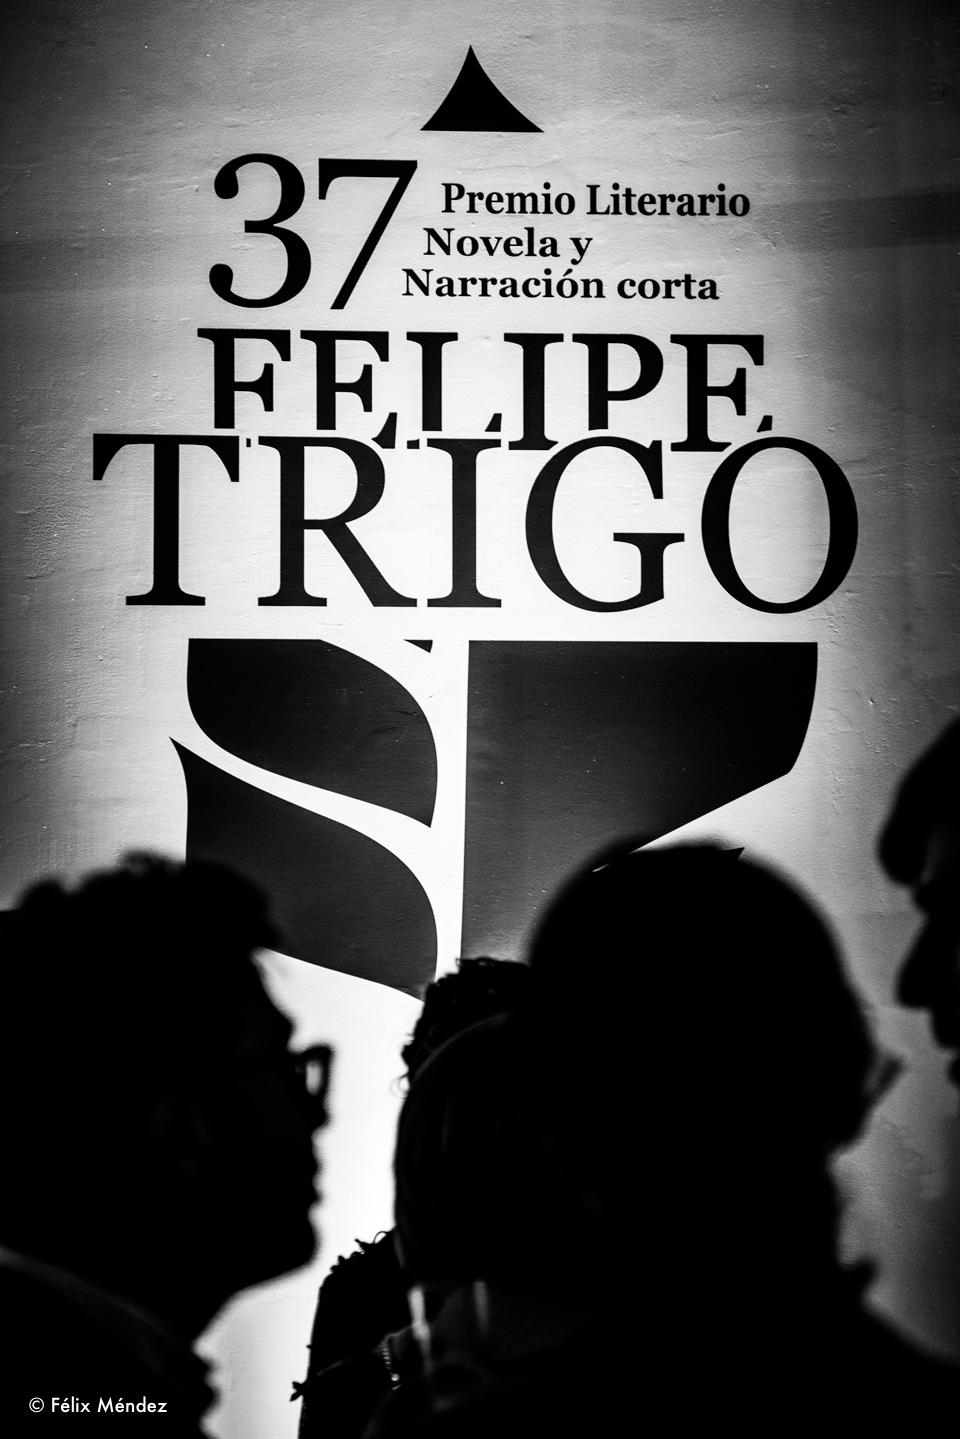 Felipe-trigo Premios3-culturabadajoz